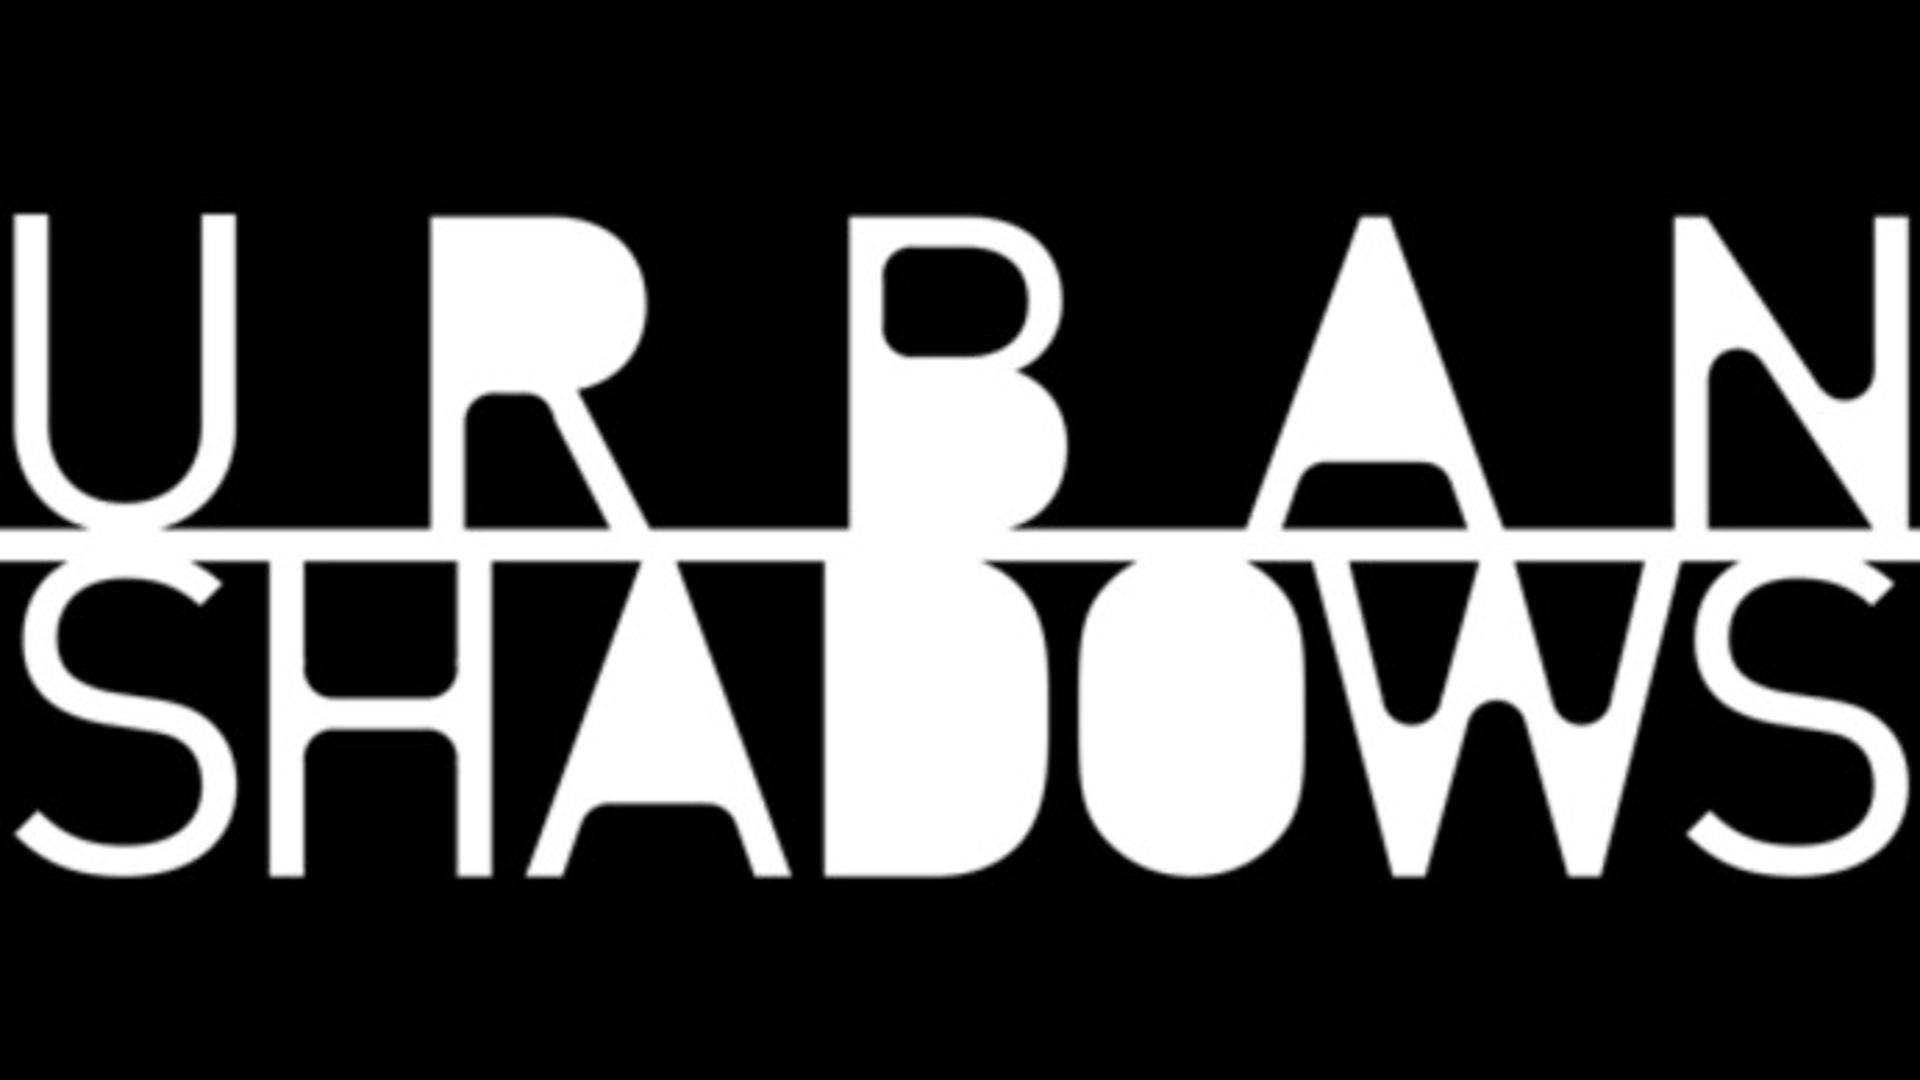 urban shadows large.jpg